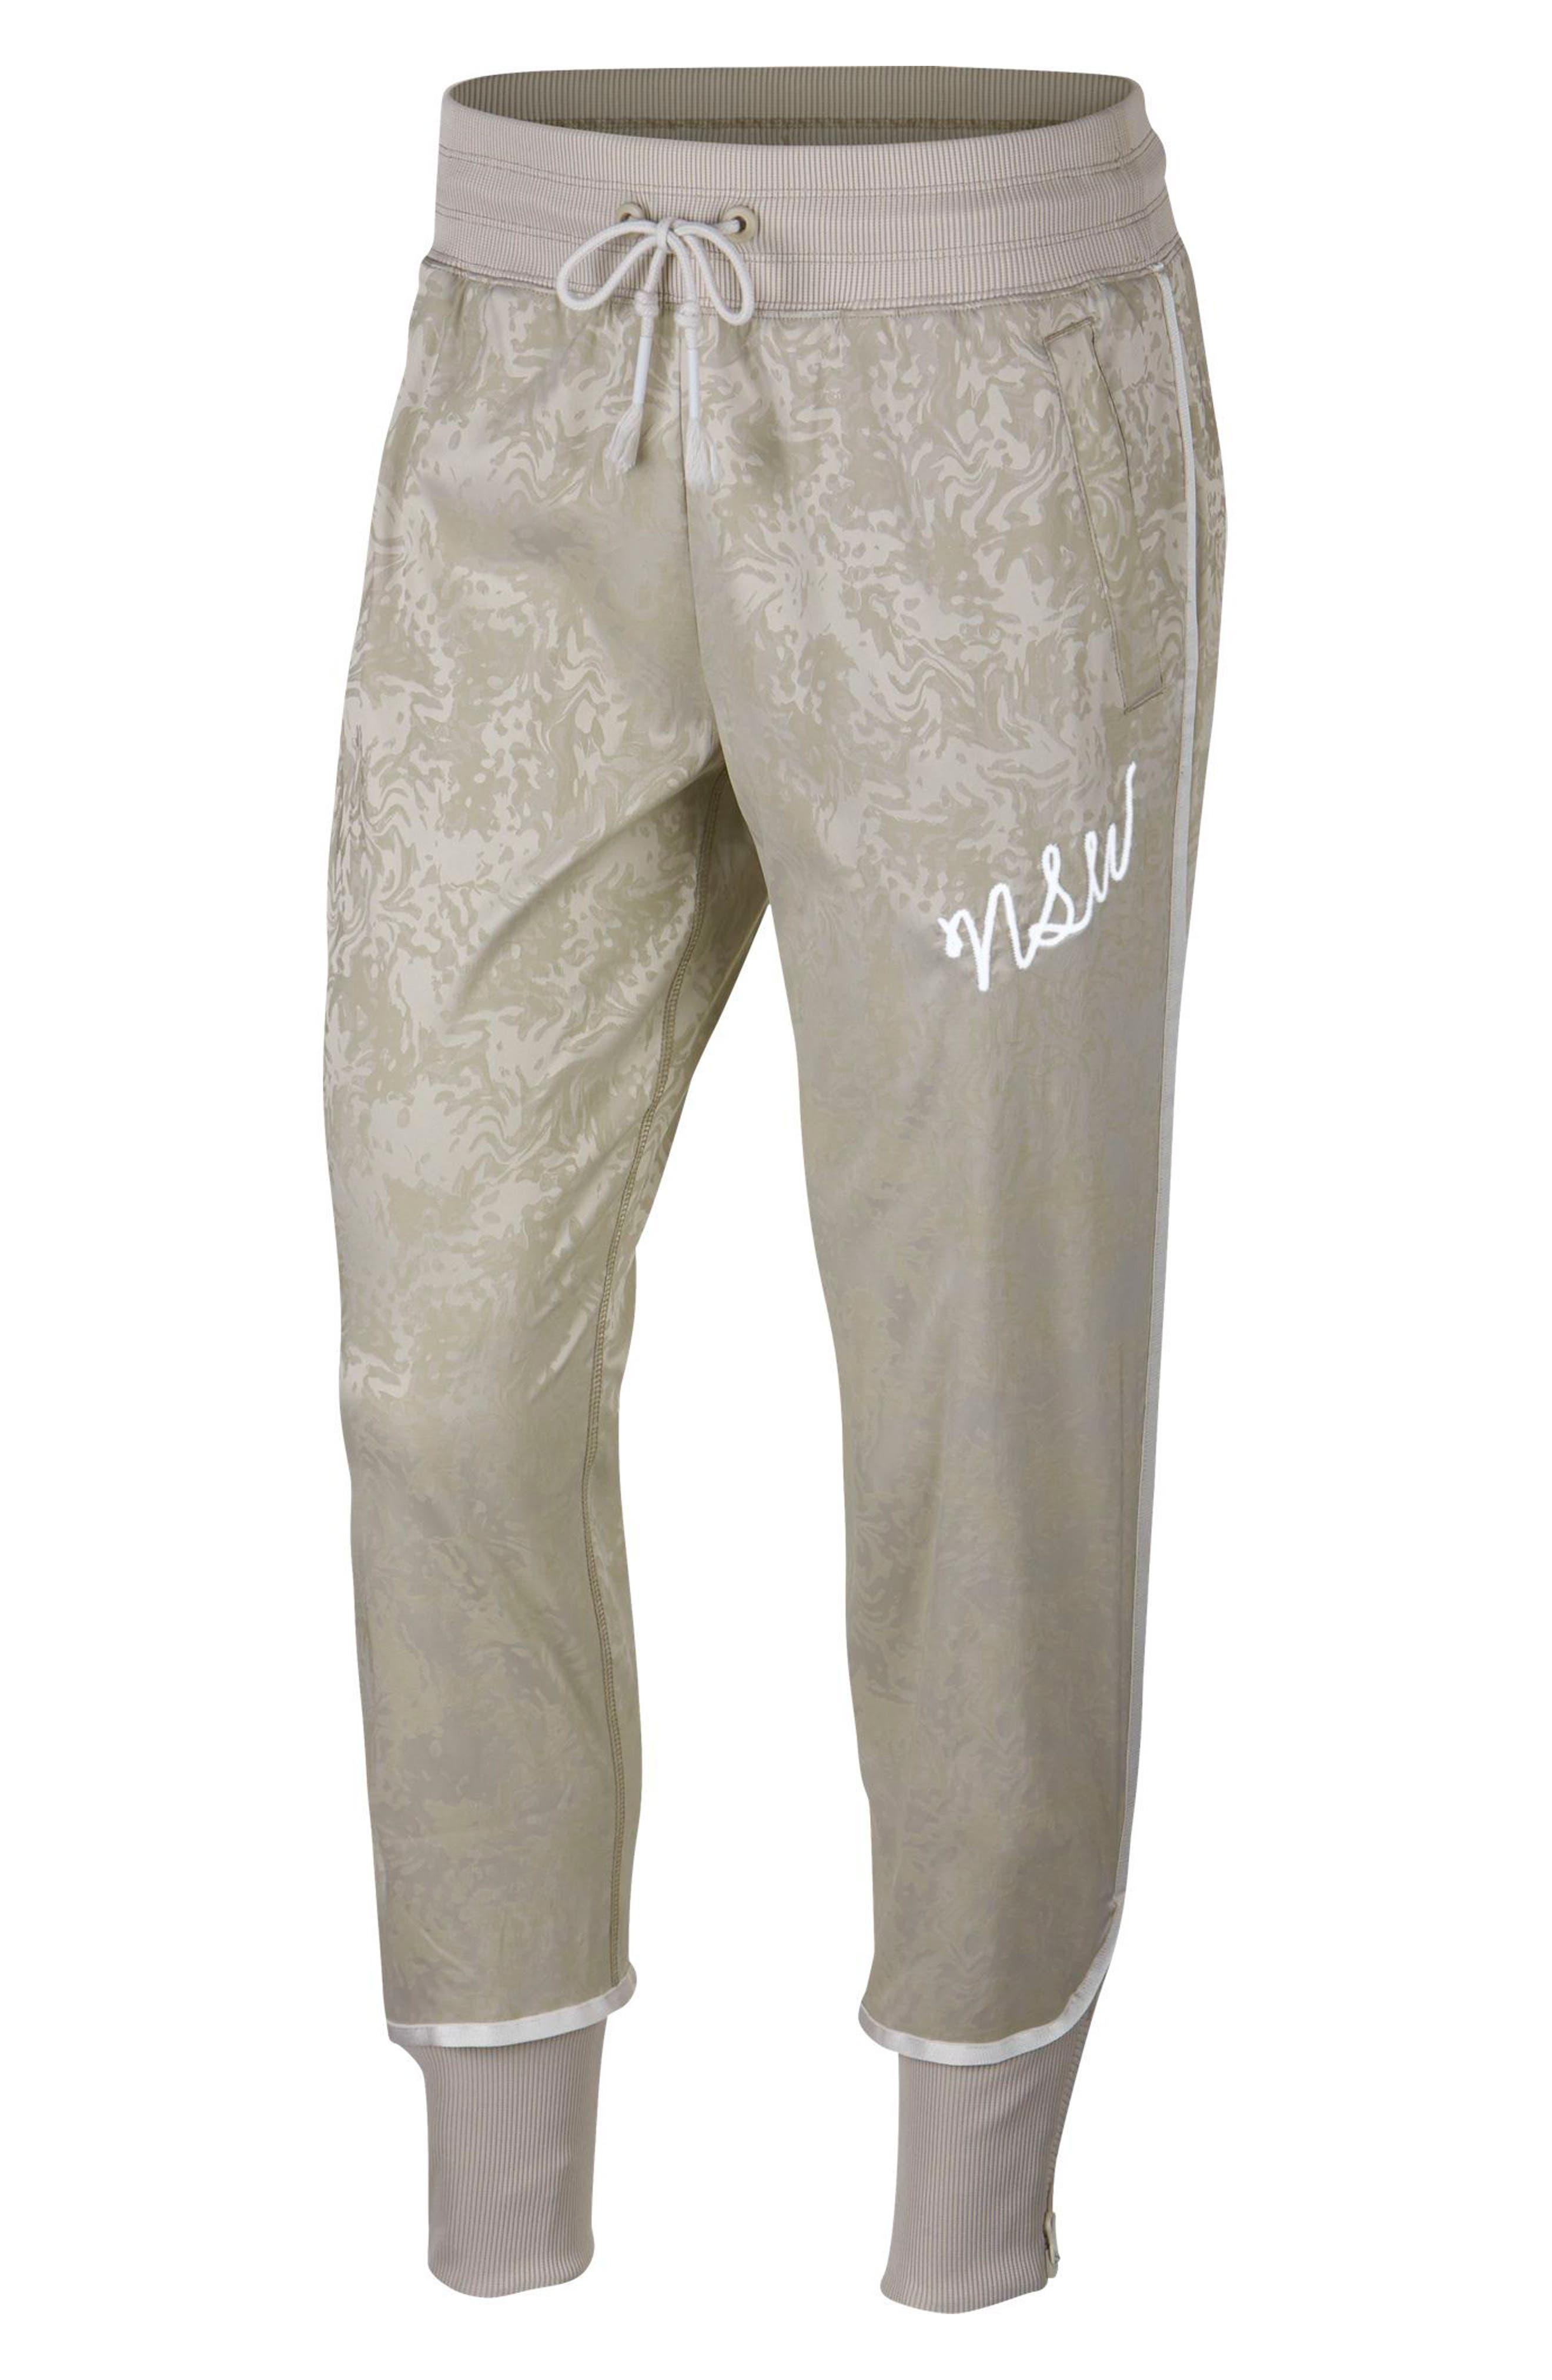 Sportswear NSW Women's Track Pants,                         Main,                         color, STRING/ PHANTOM/ WHITE